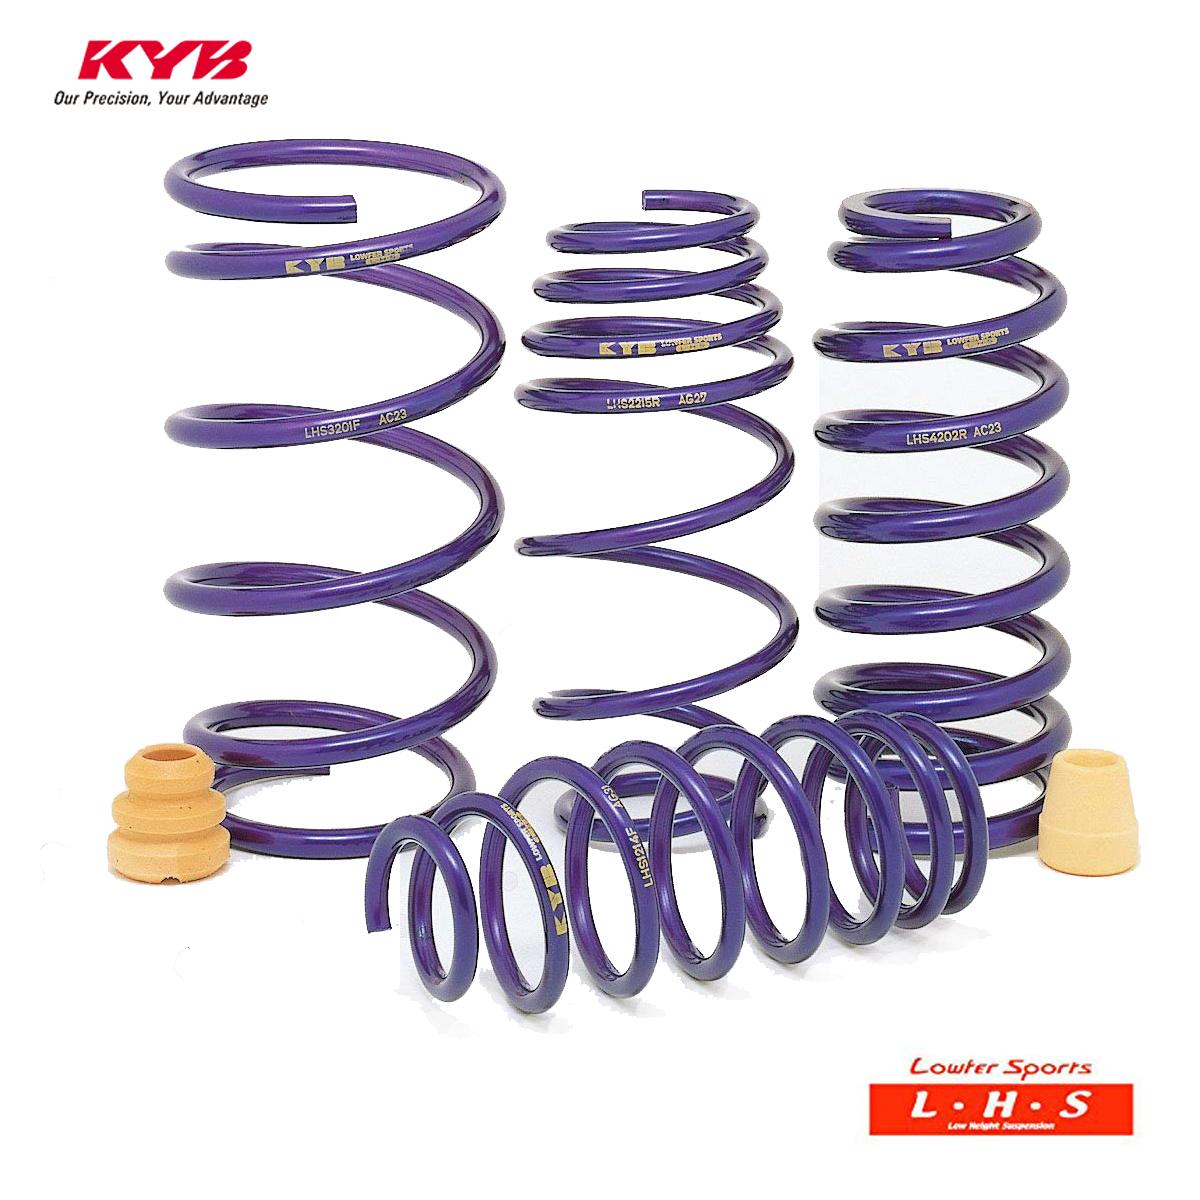 KYB カヤバ タントエグゼ L455S スプリング ダウンサス セット Lowfer Sports LHS-L455SRS 配送先条件有り